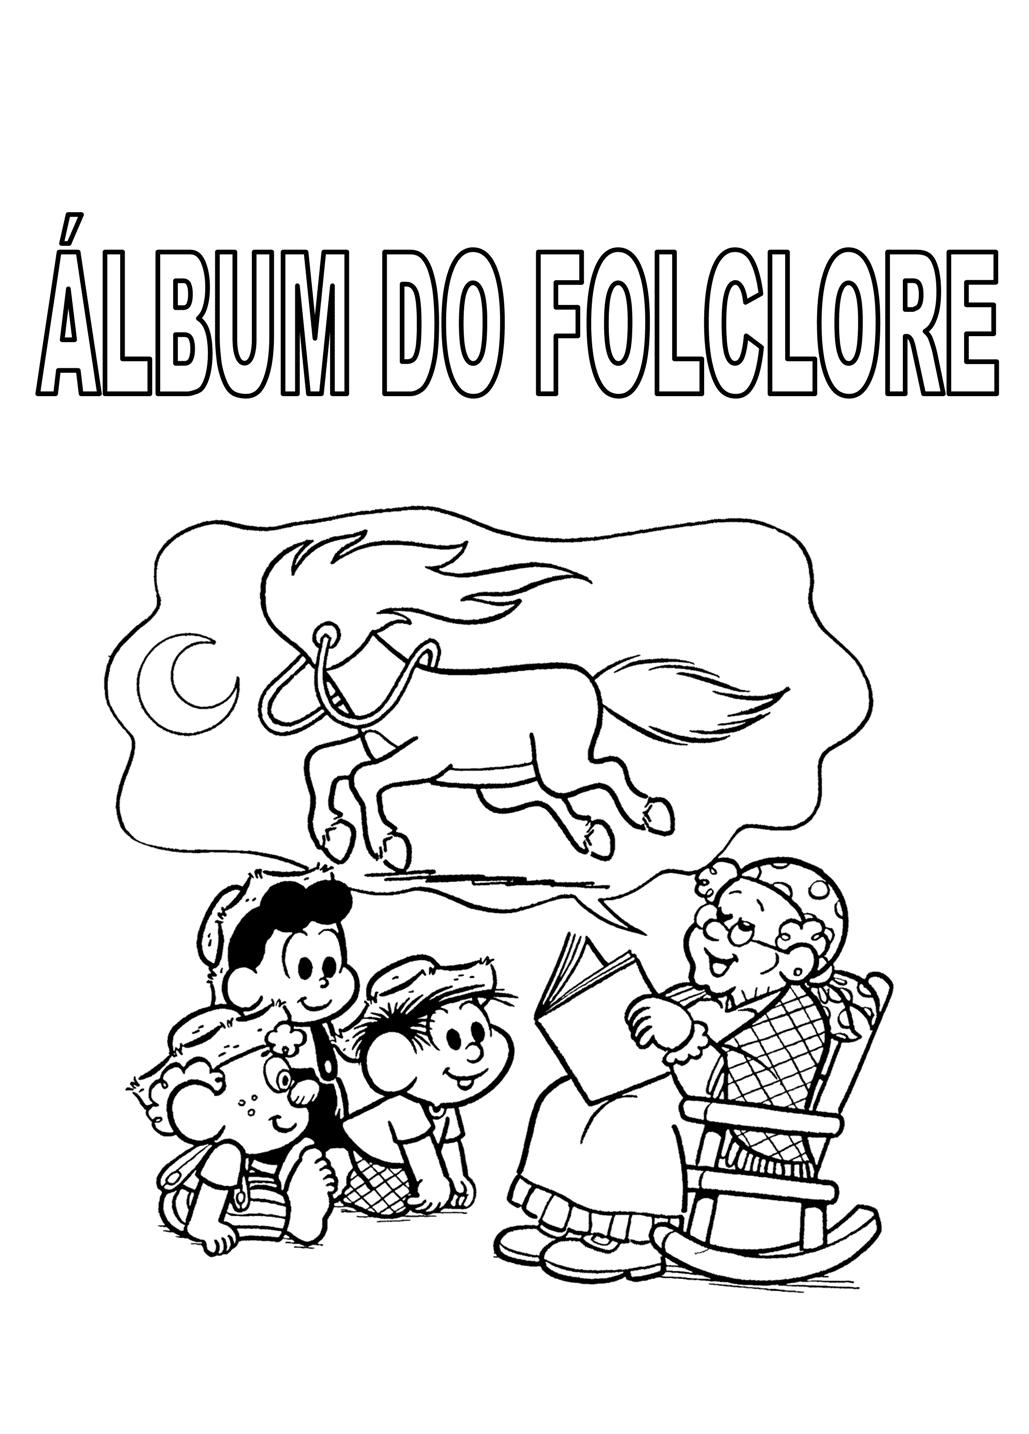 imagens para colorir folclore brasileiro - desenhos para imprimir e colorir do folclore brasileiro